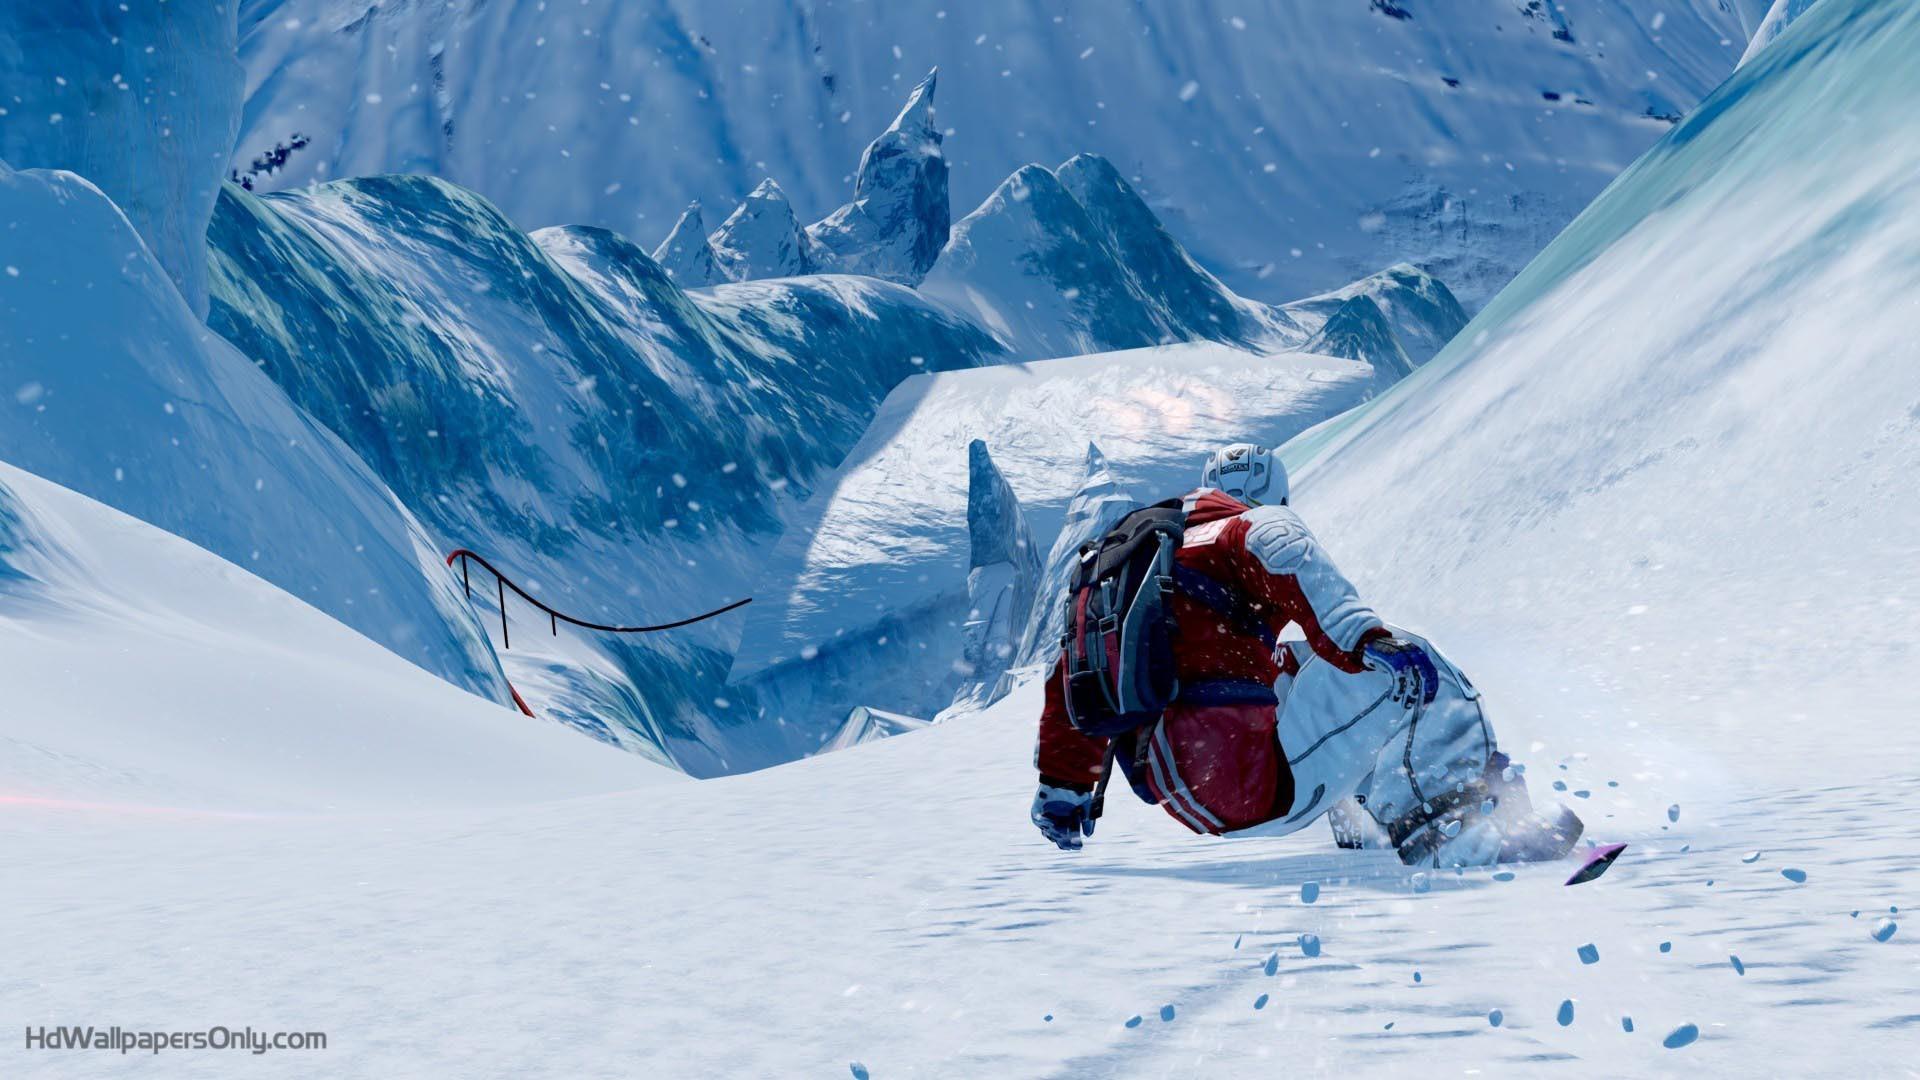 Snowboarding Desktop Backgrounds 71 Pictures